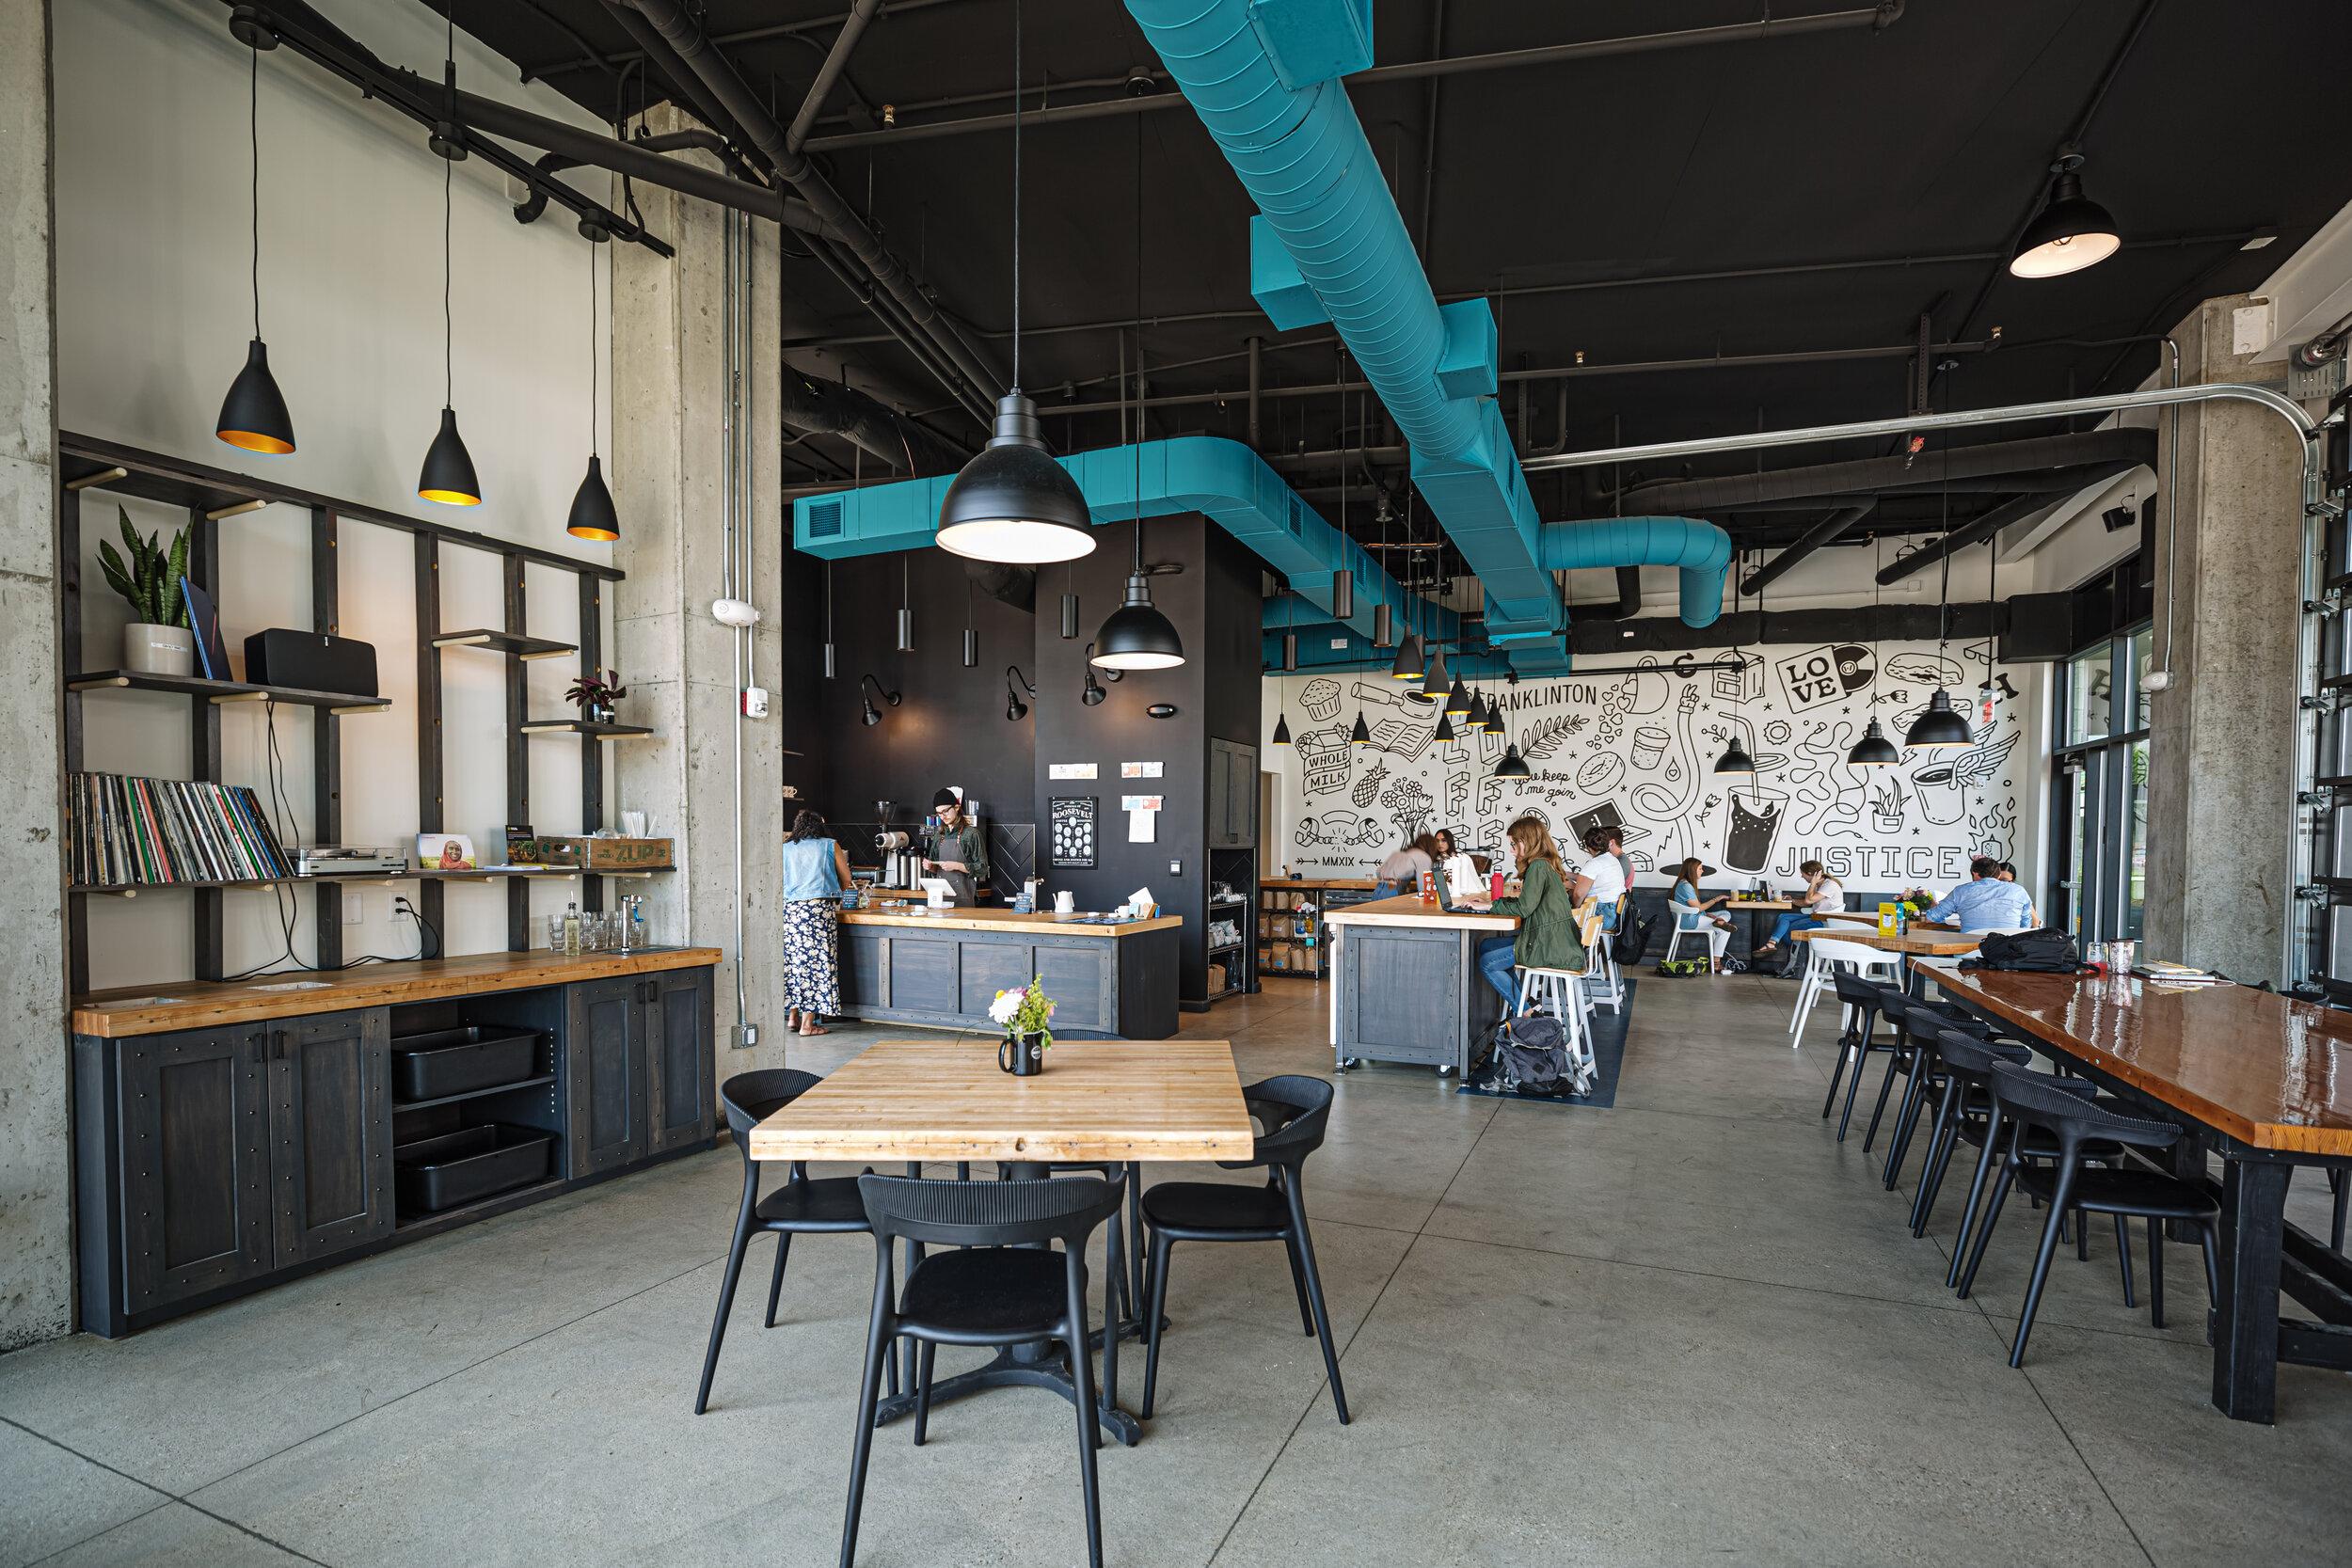 TRIAD Architects_Roosevelt Coffee_Interior Photographic Image_Seating Area 03.jpg